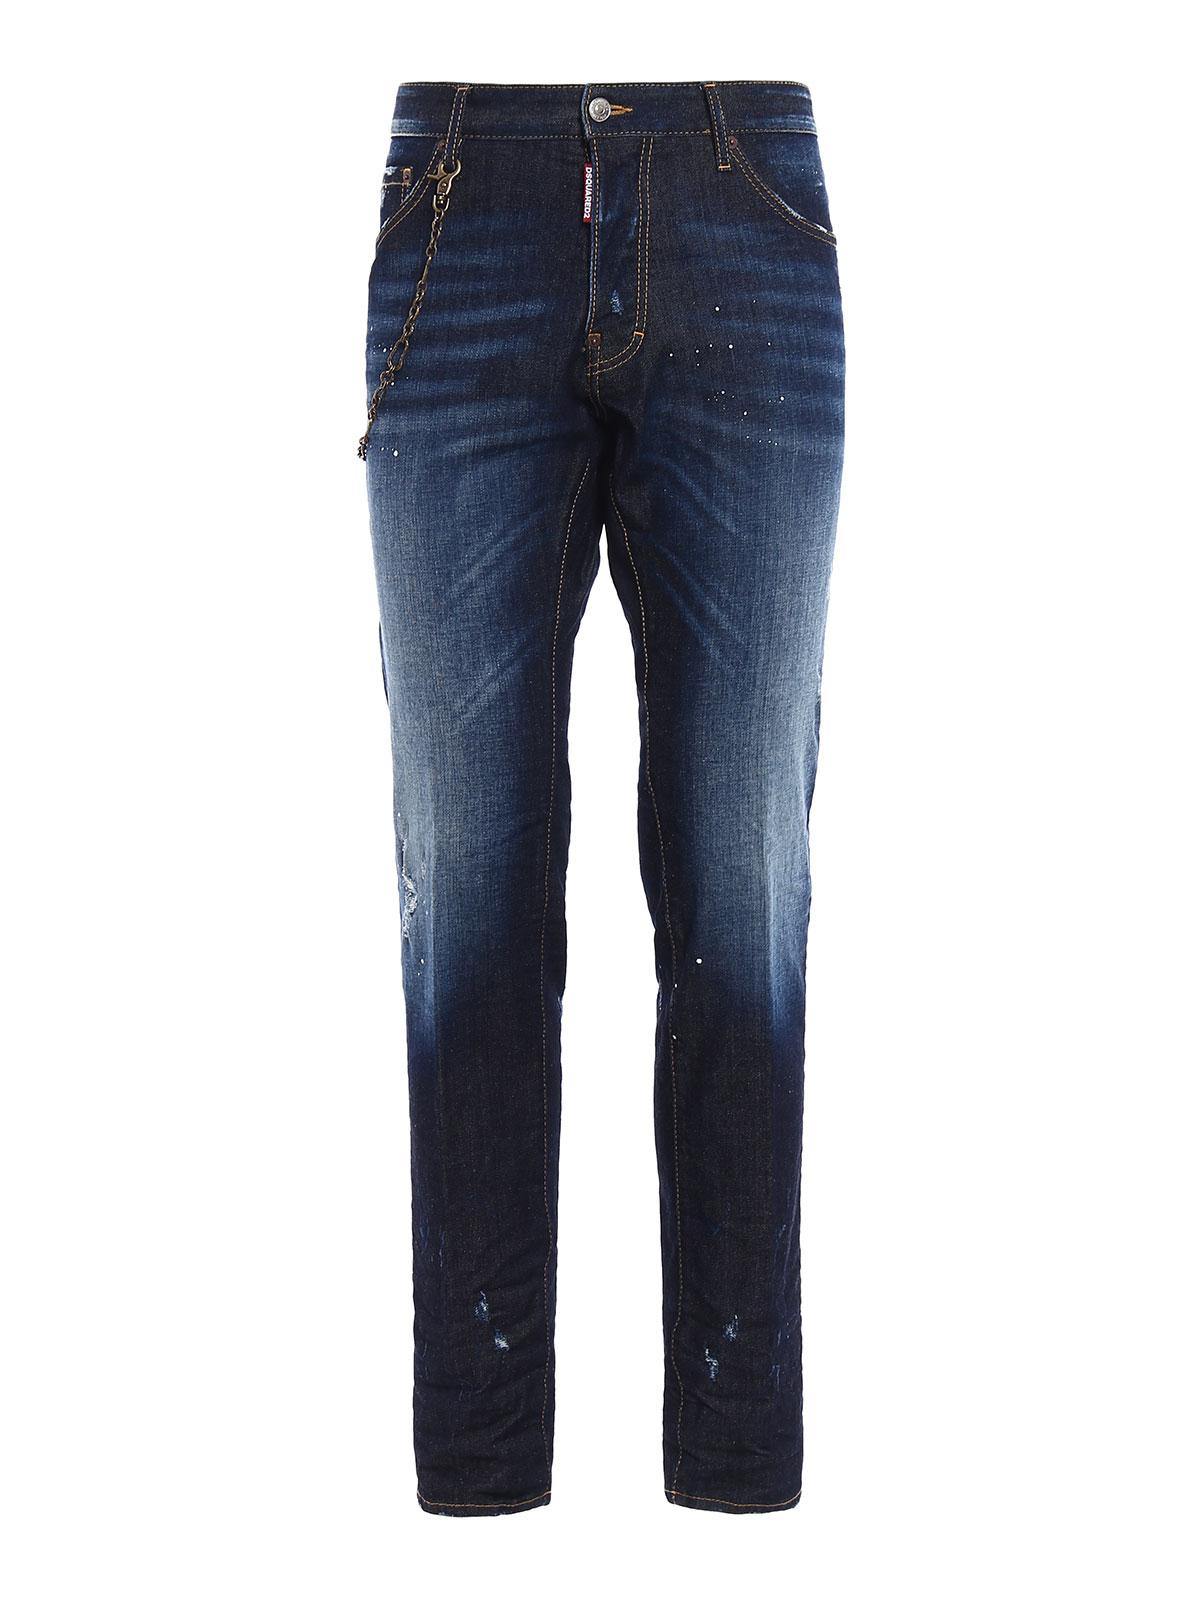 Dsquared2 Straight Leg Jeans Dark Wash Straight Leg